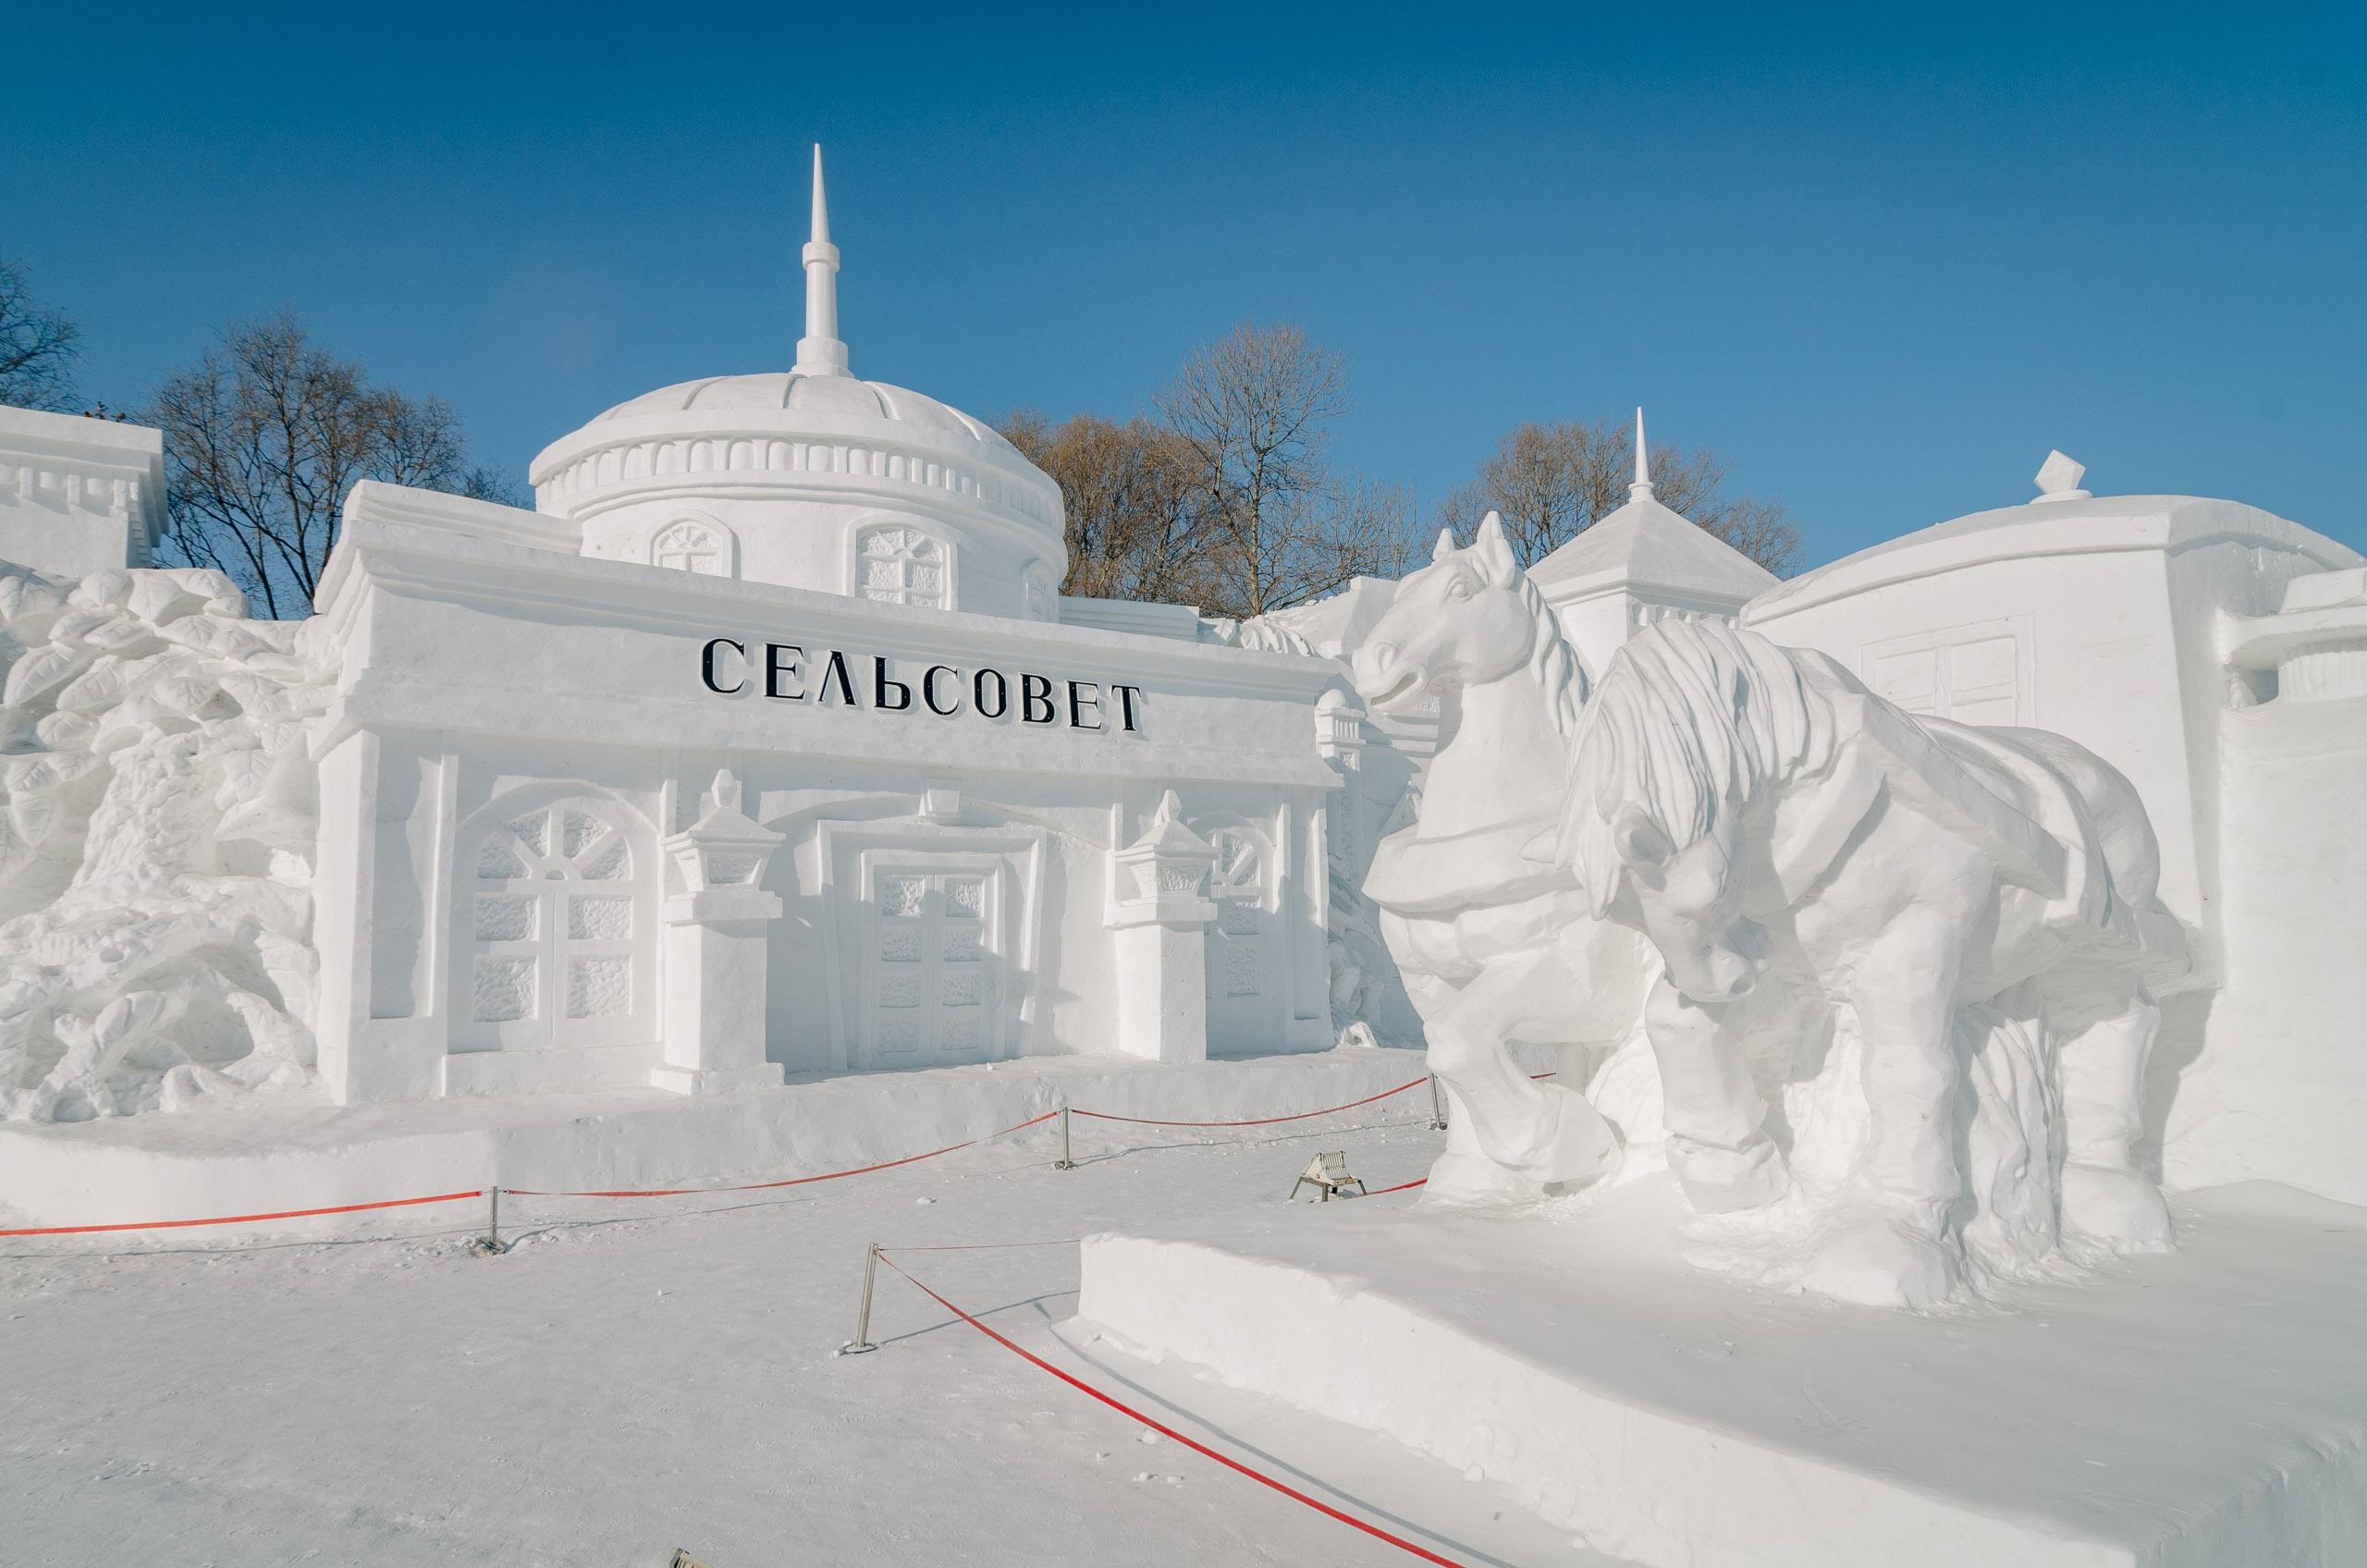 Harbin China Ice Festival - 2012-0108-DSC_2102_117384